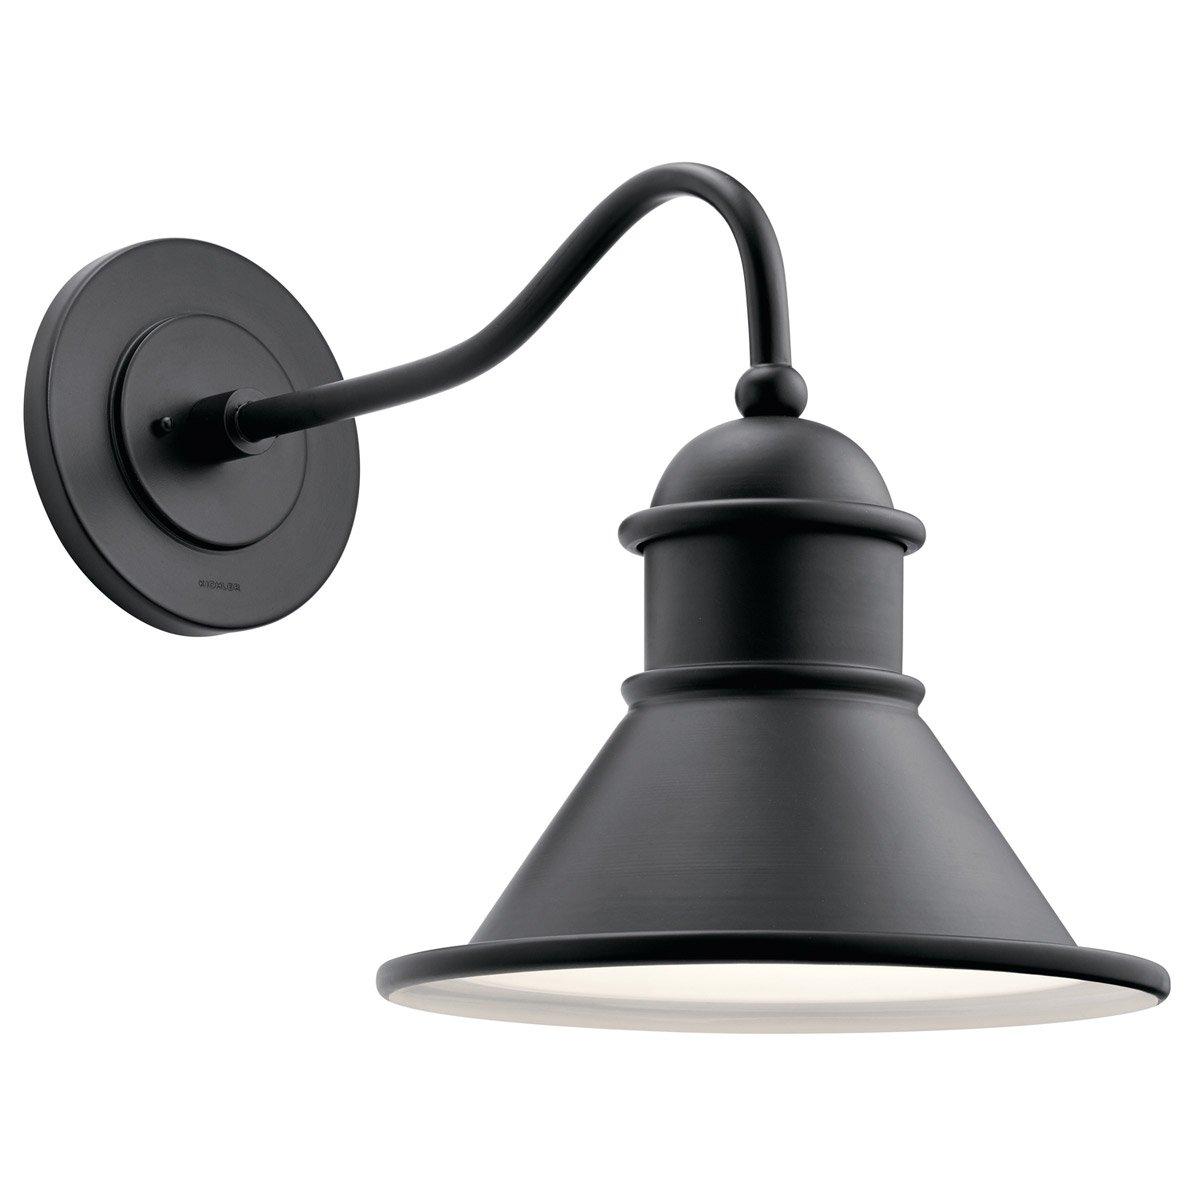 Kichler 49776BK Northland 14'' Outdoor Wall Sconce in Black